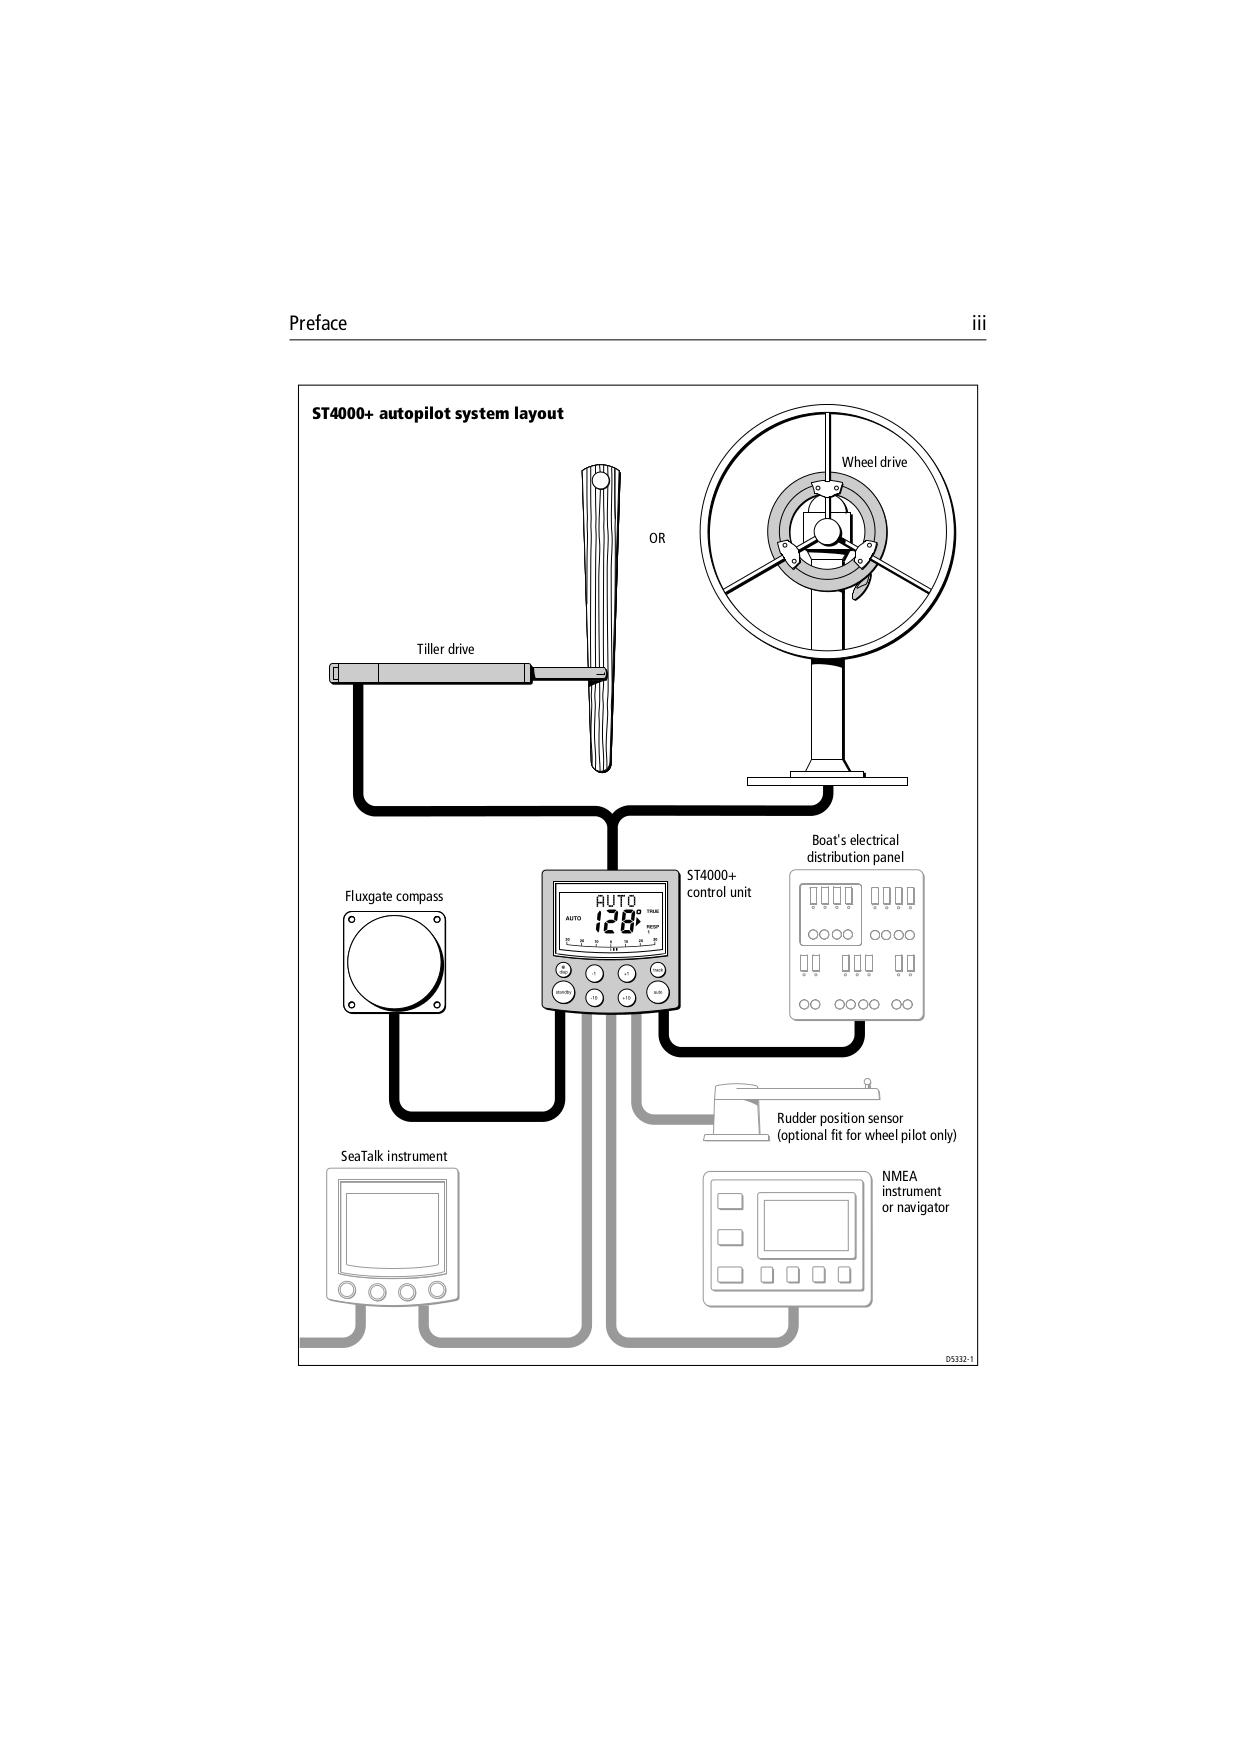 Manual For Raymarine Gps Autohelm